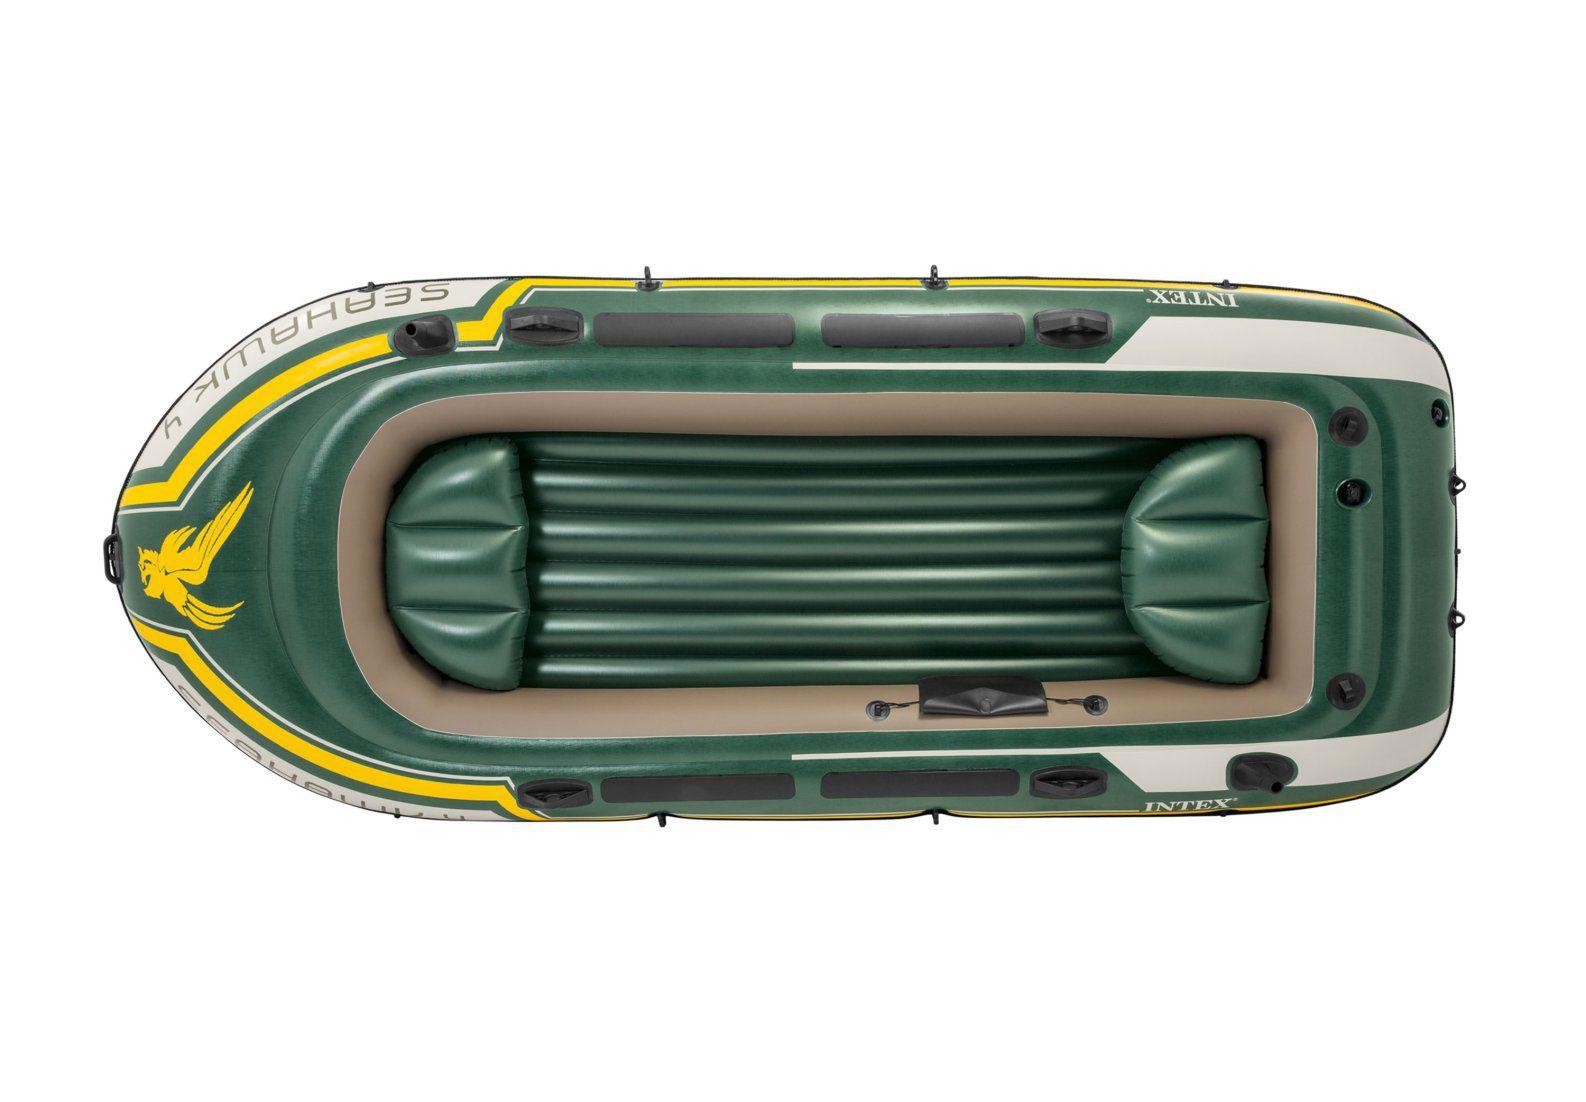 Bote Canoa Inflável SeaHawk  400 + Remo Fole  Intex #68351